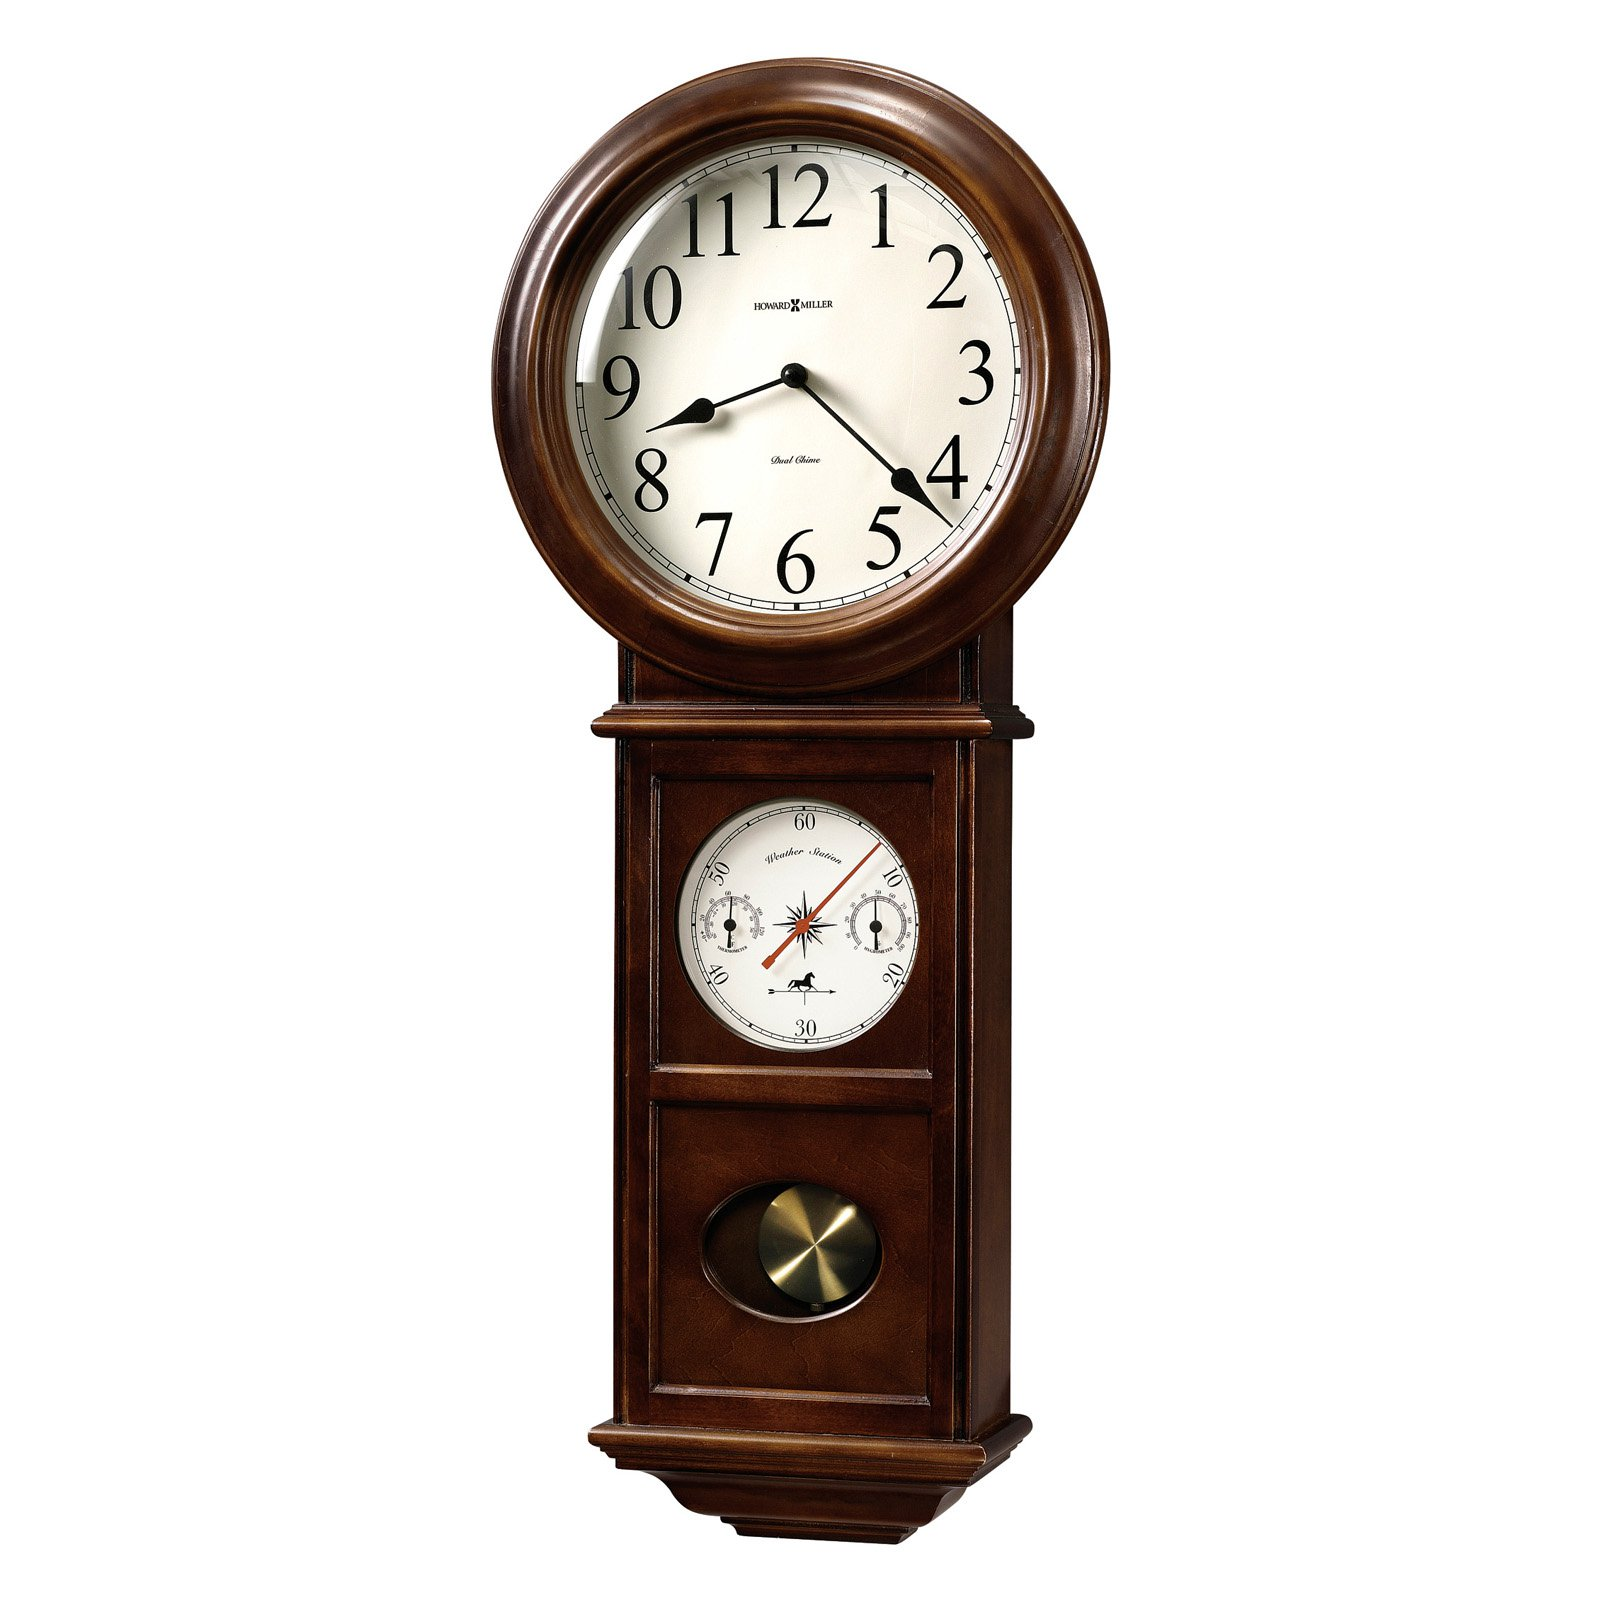 Howard Miller 625-399 Crowley Wall Clock 14-in. Wide by Howard Miller